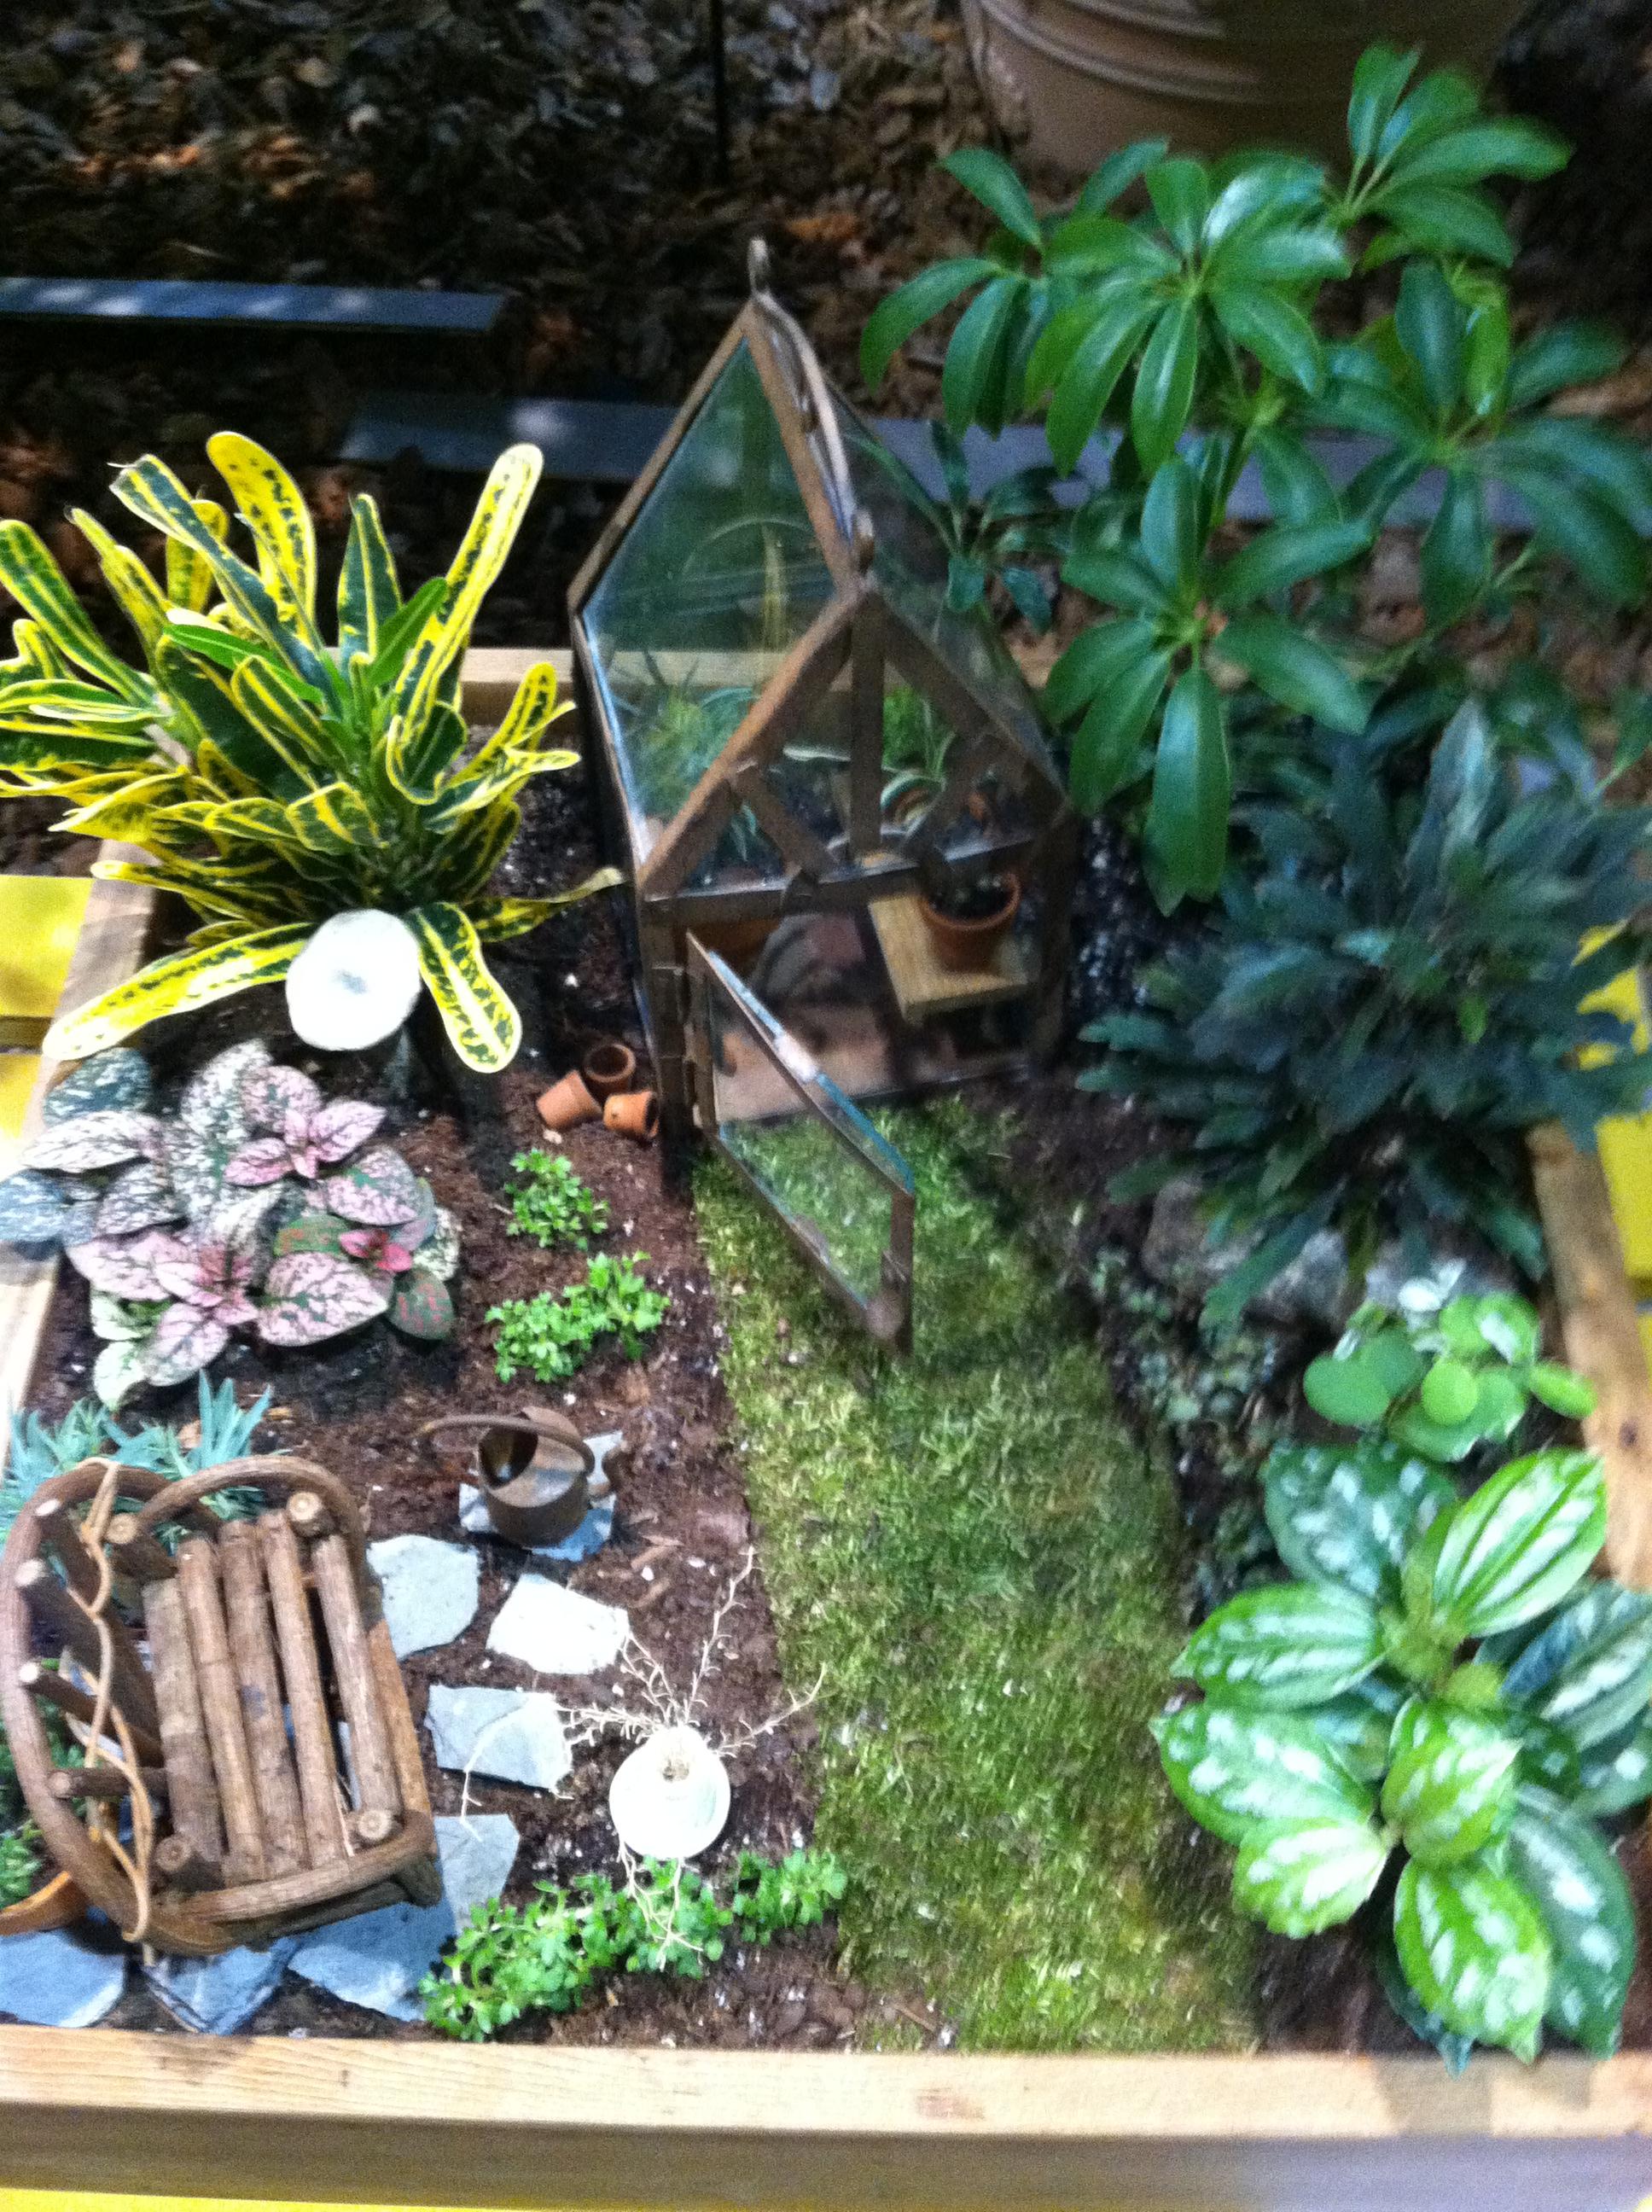 Miniature Gardens Whimsical Creations The Garden Diaries